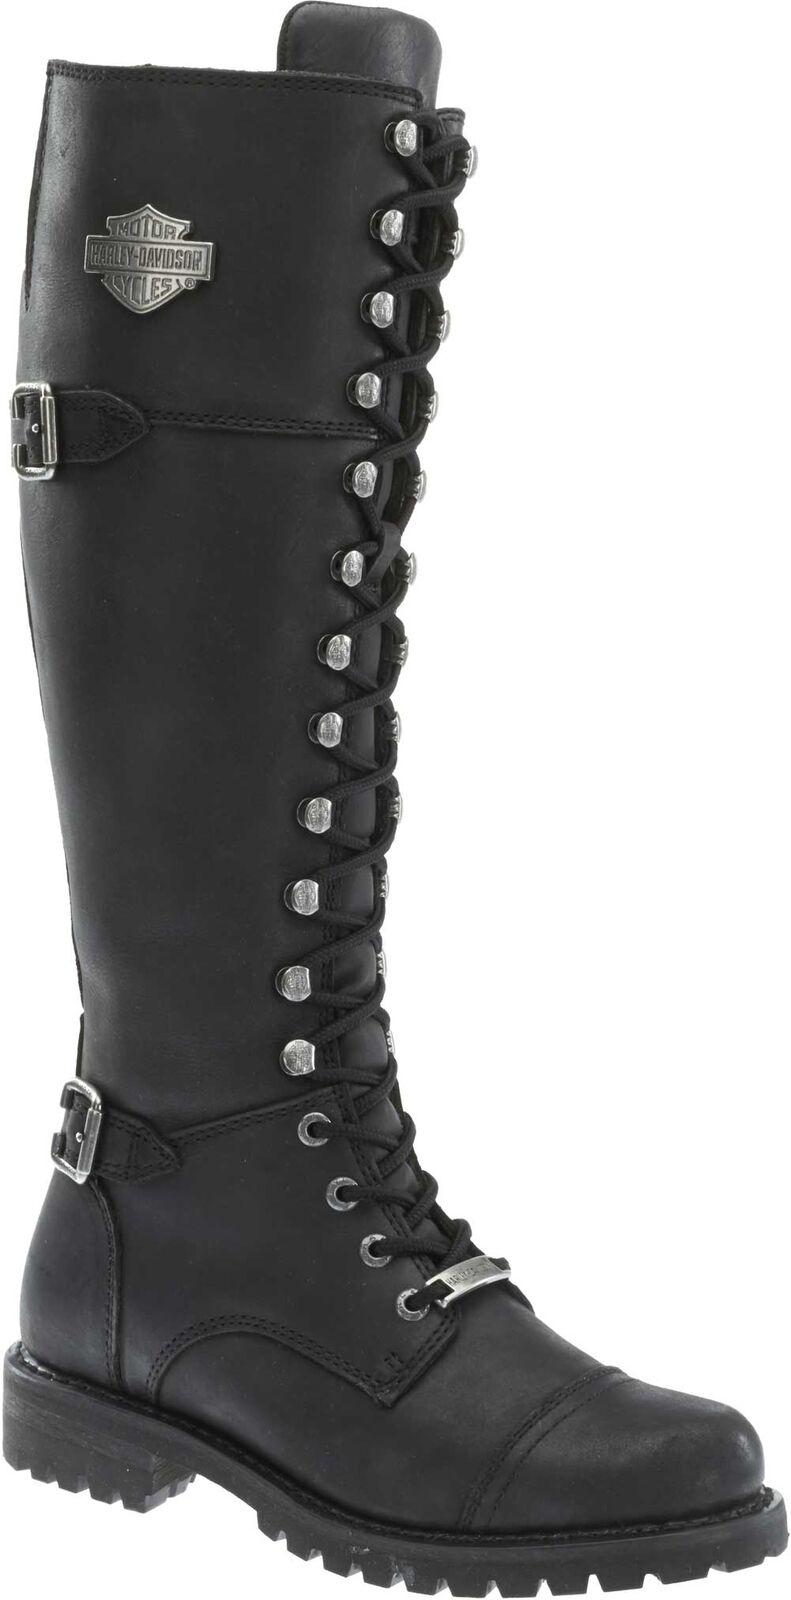 Harley-Davidson Women's Beechwood 15  Motorcycle Boots Black Brn or Stone D83856